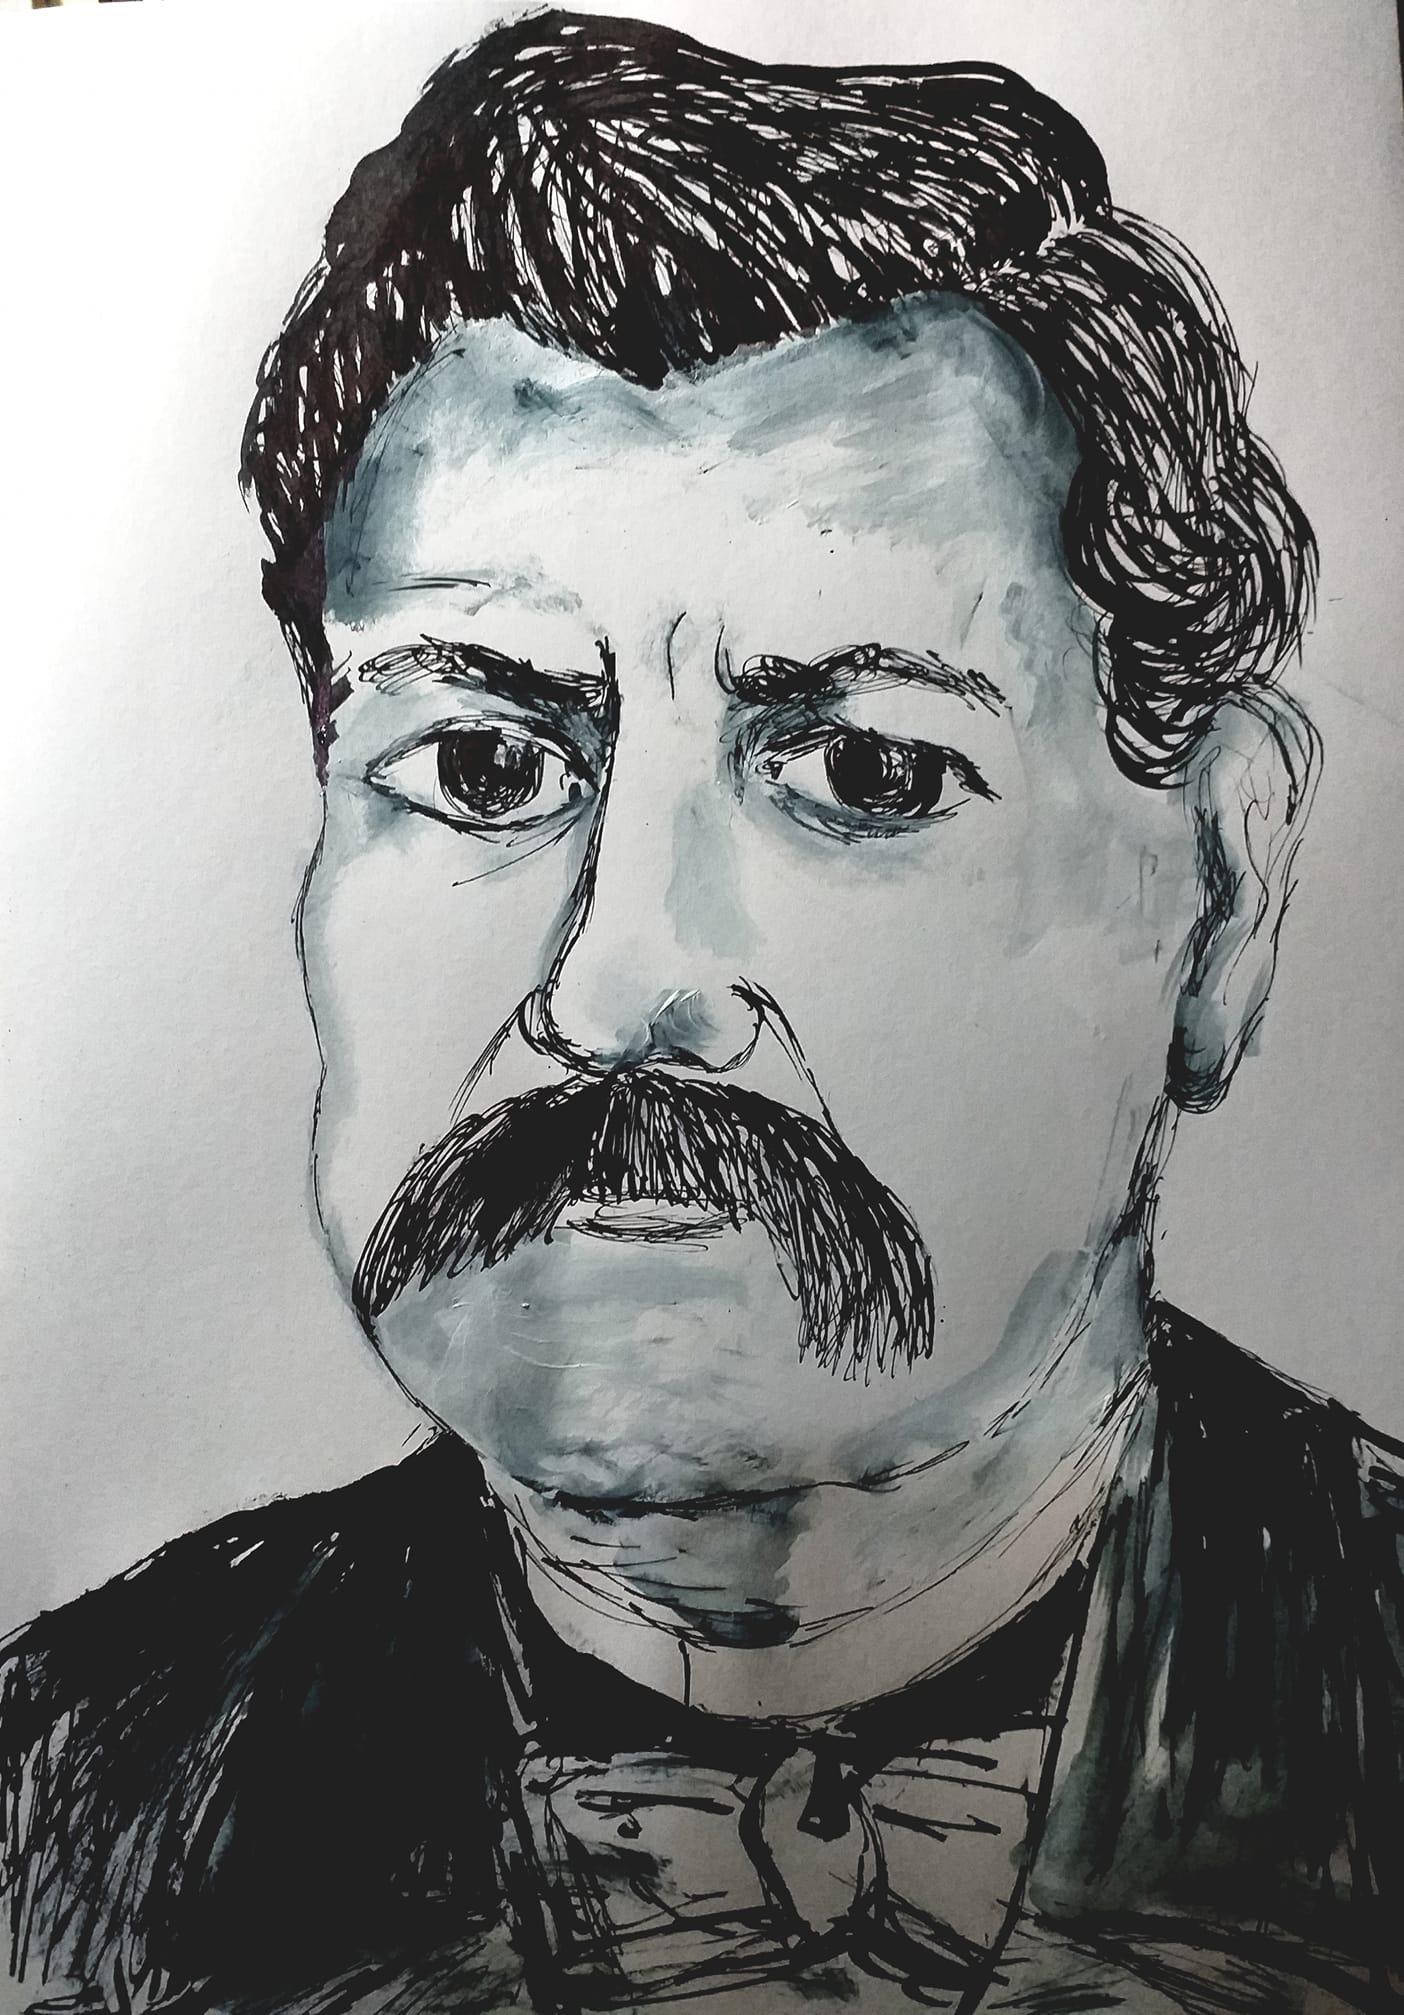 portret_stefan_mitrov_ljubisa_rajna_krulj